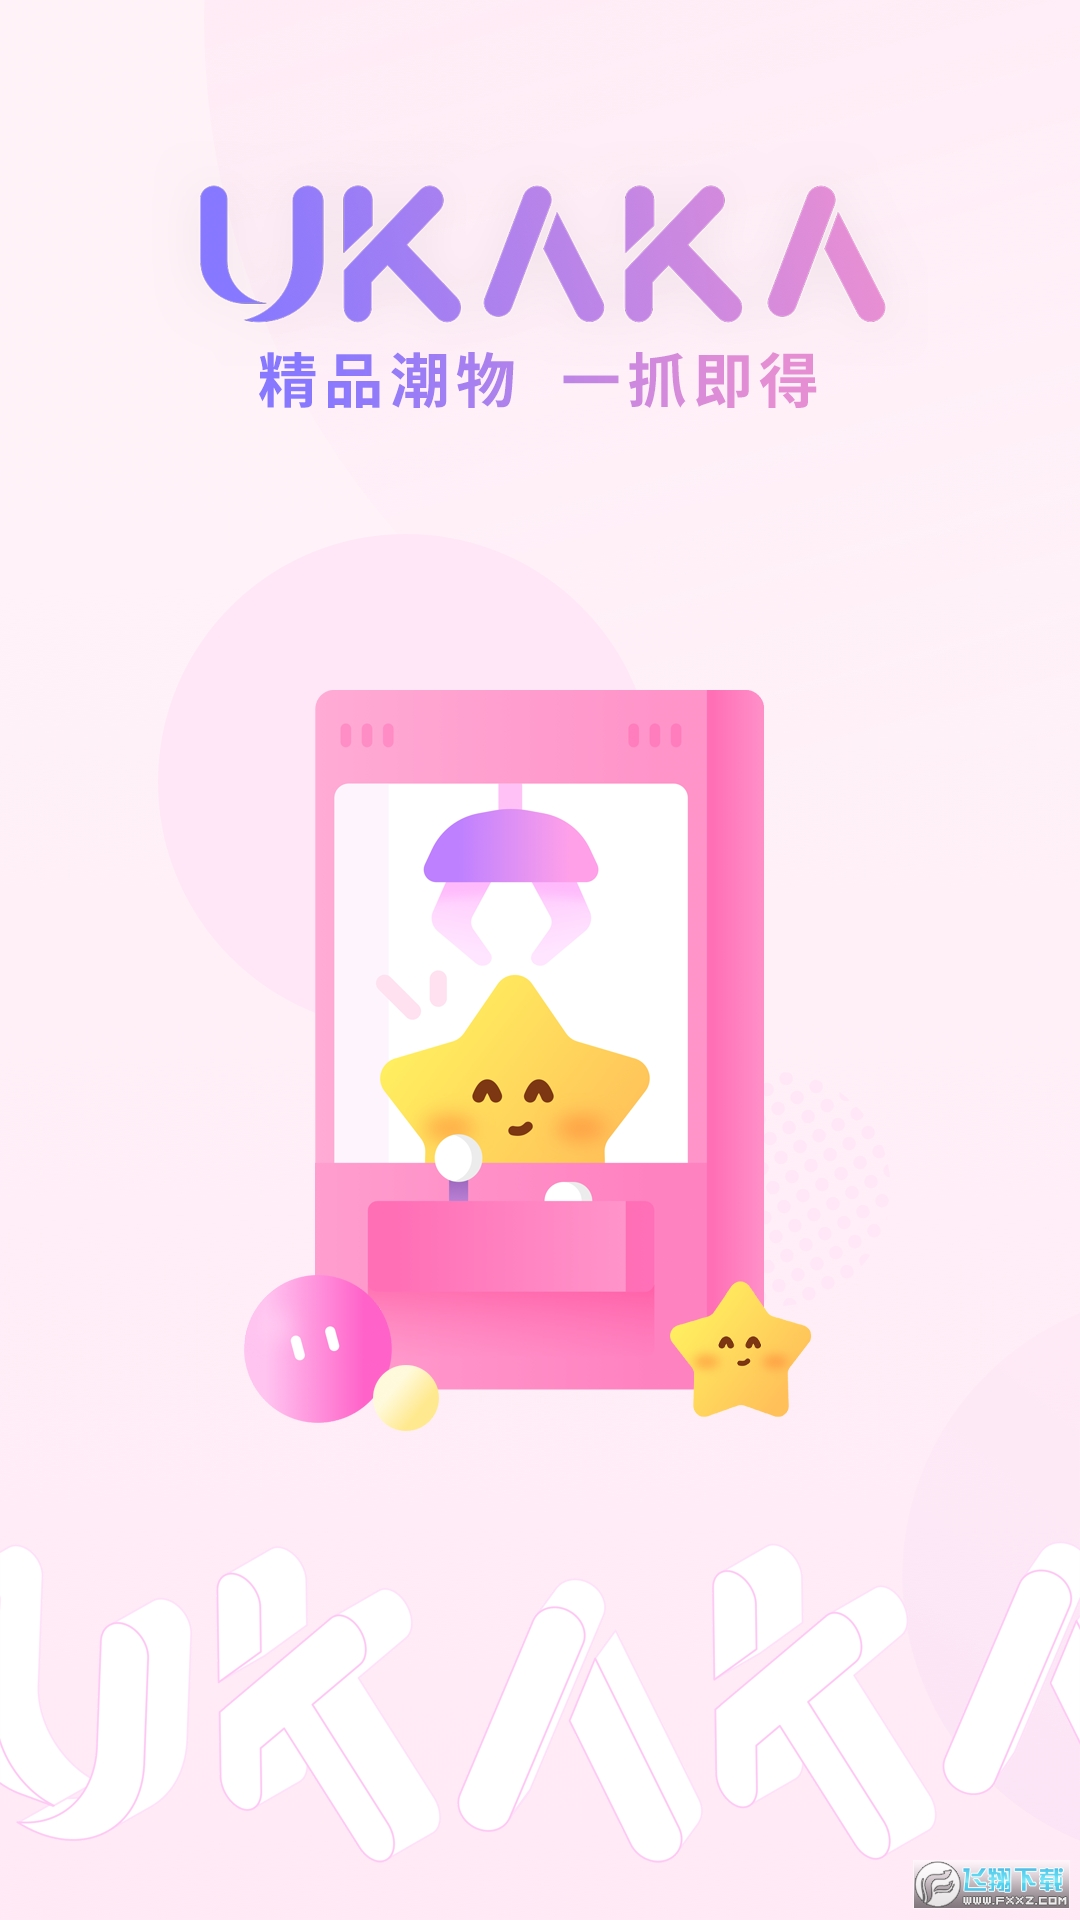 UKAKA抓娃娃appv1.0.2安卓版截图3